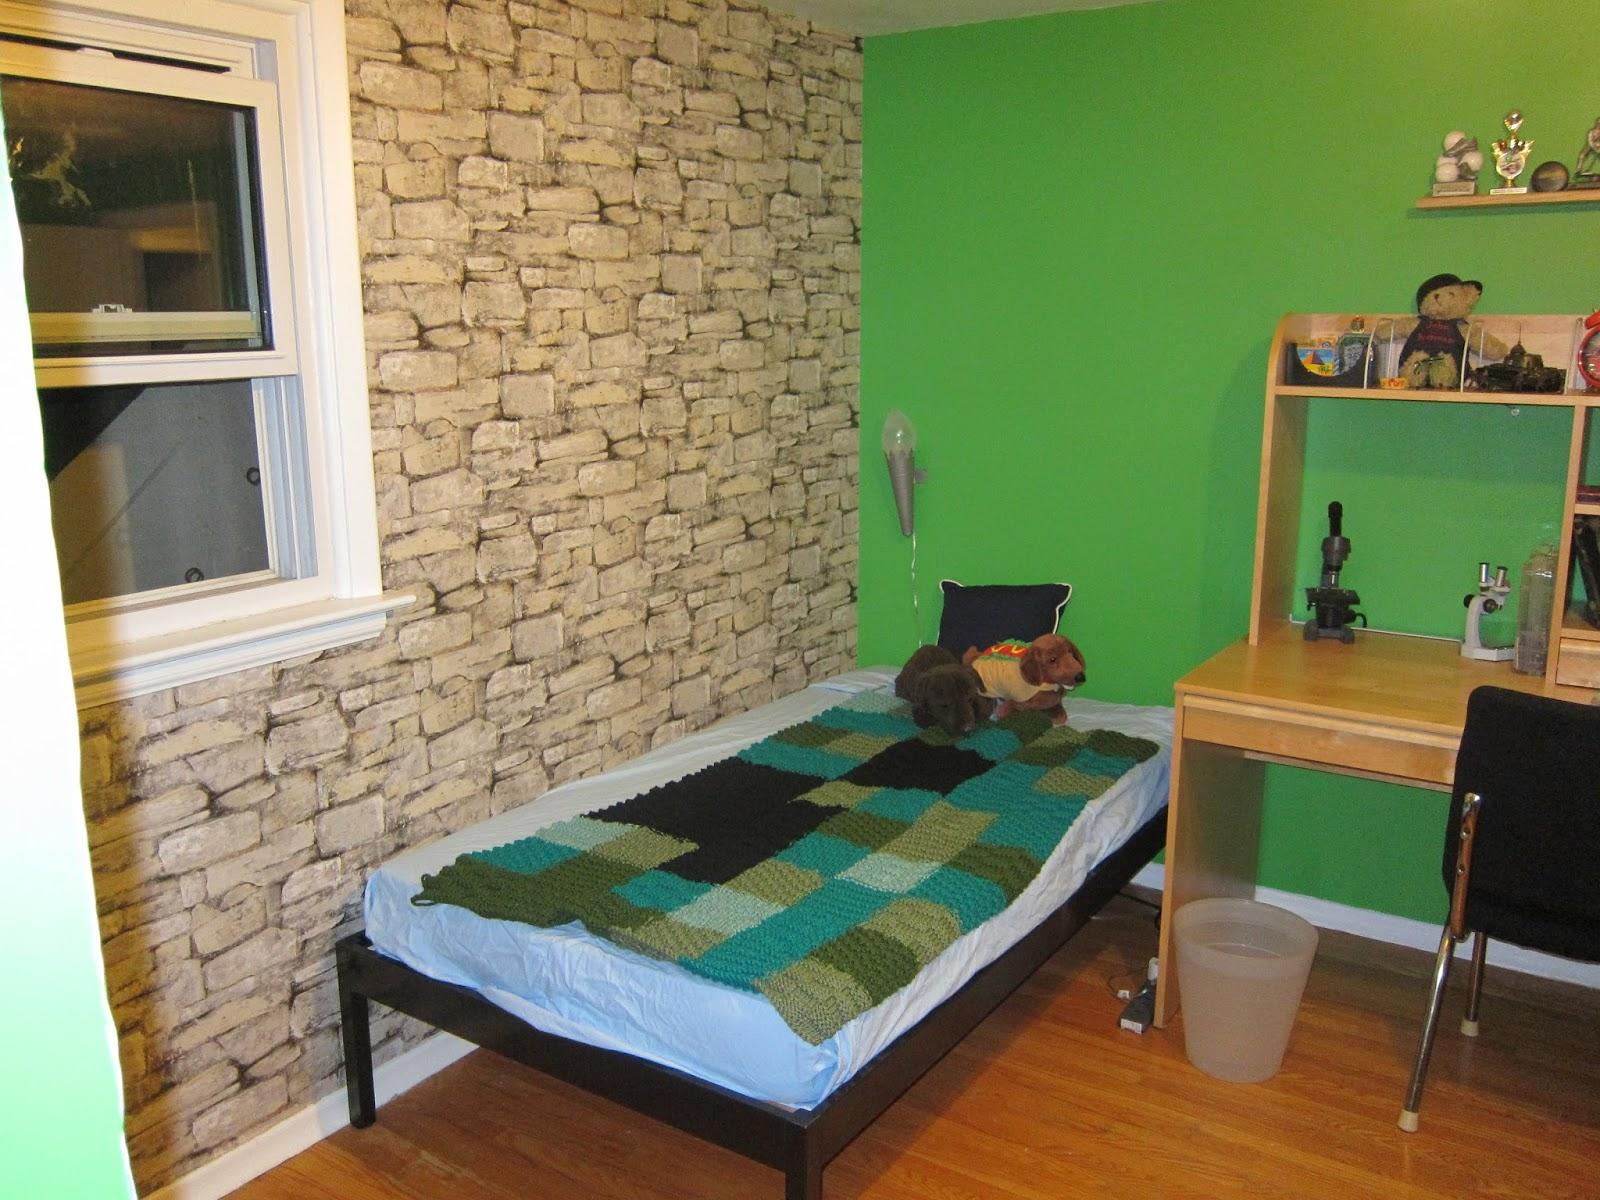 Gallery For gt Minecraft Bedroom Wallpaper 1600x1200